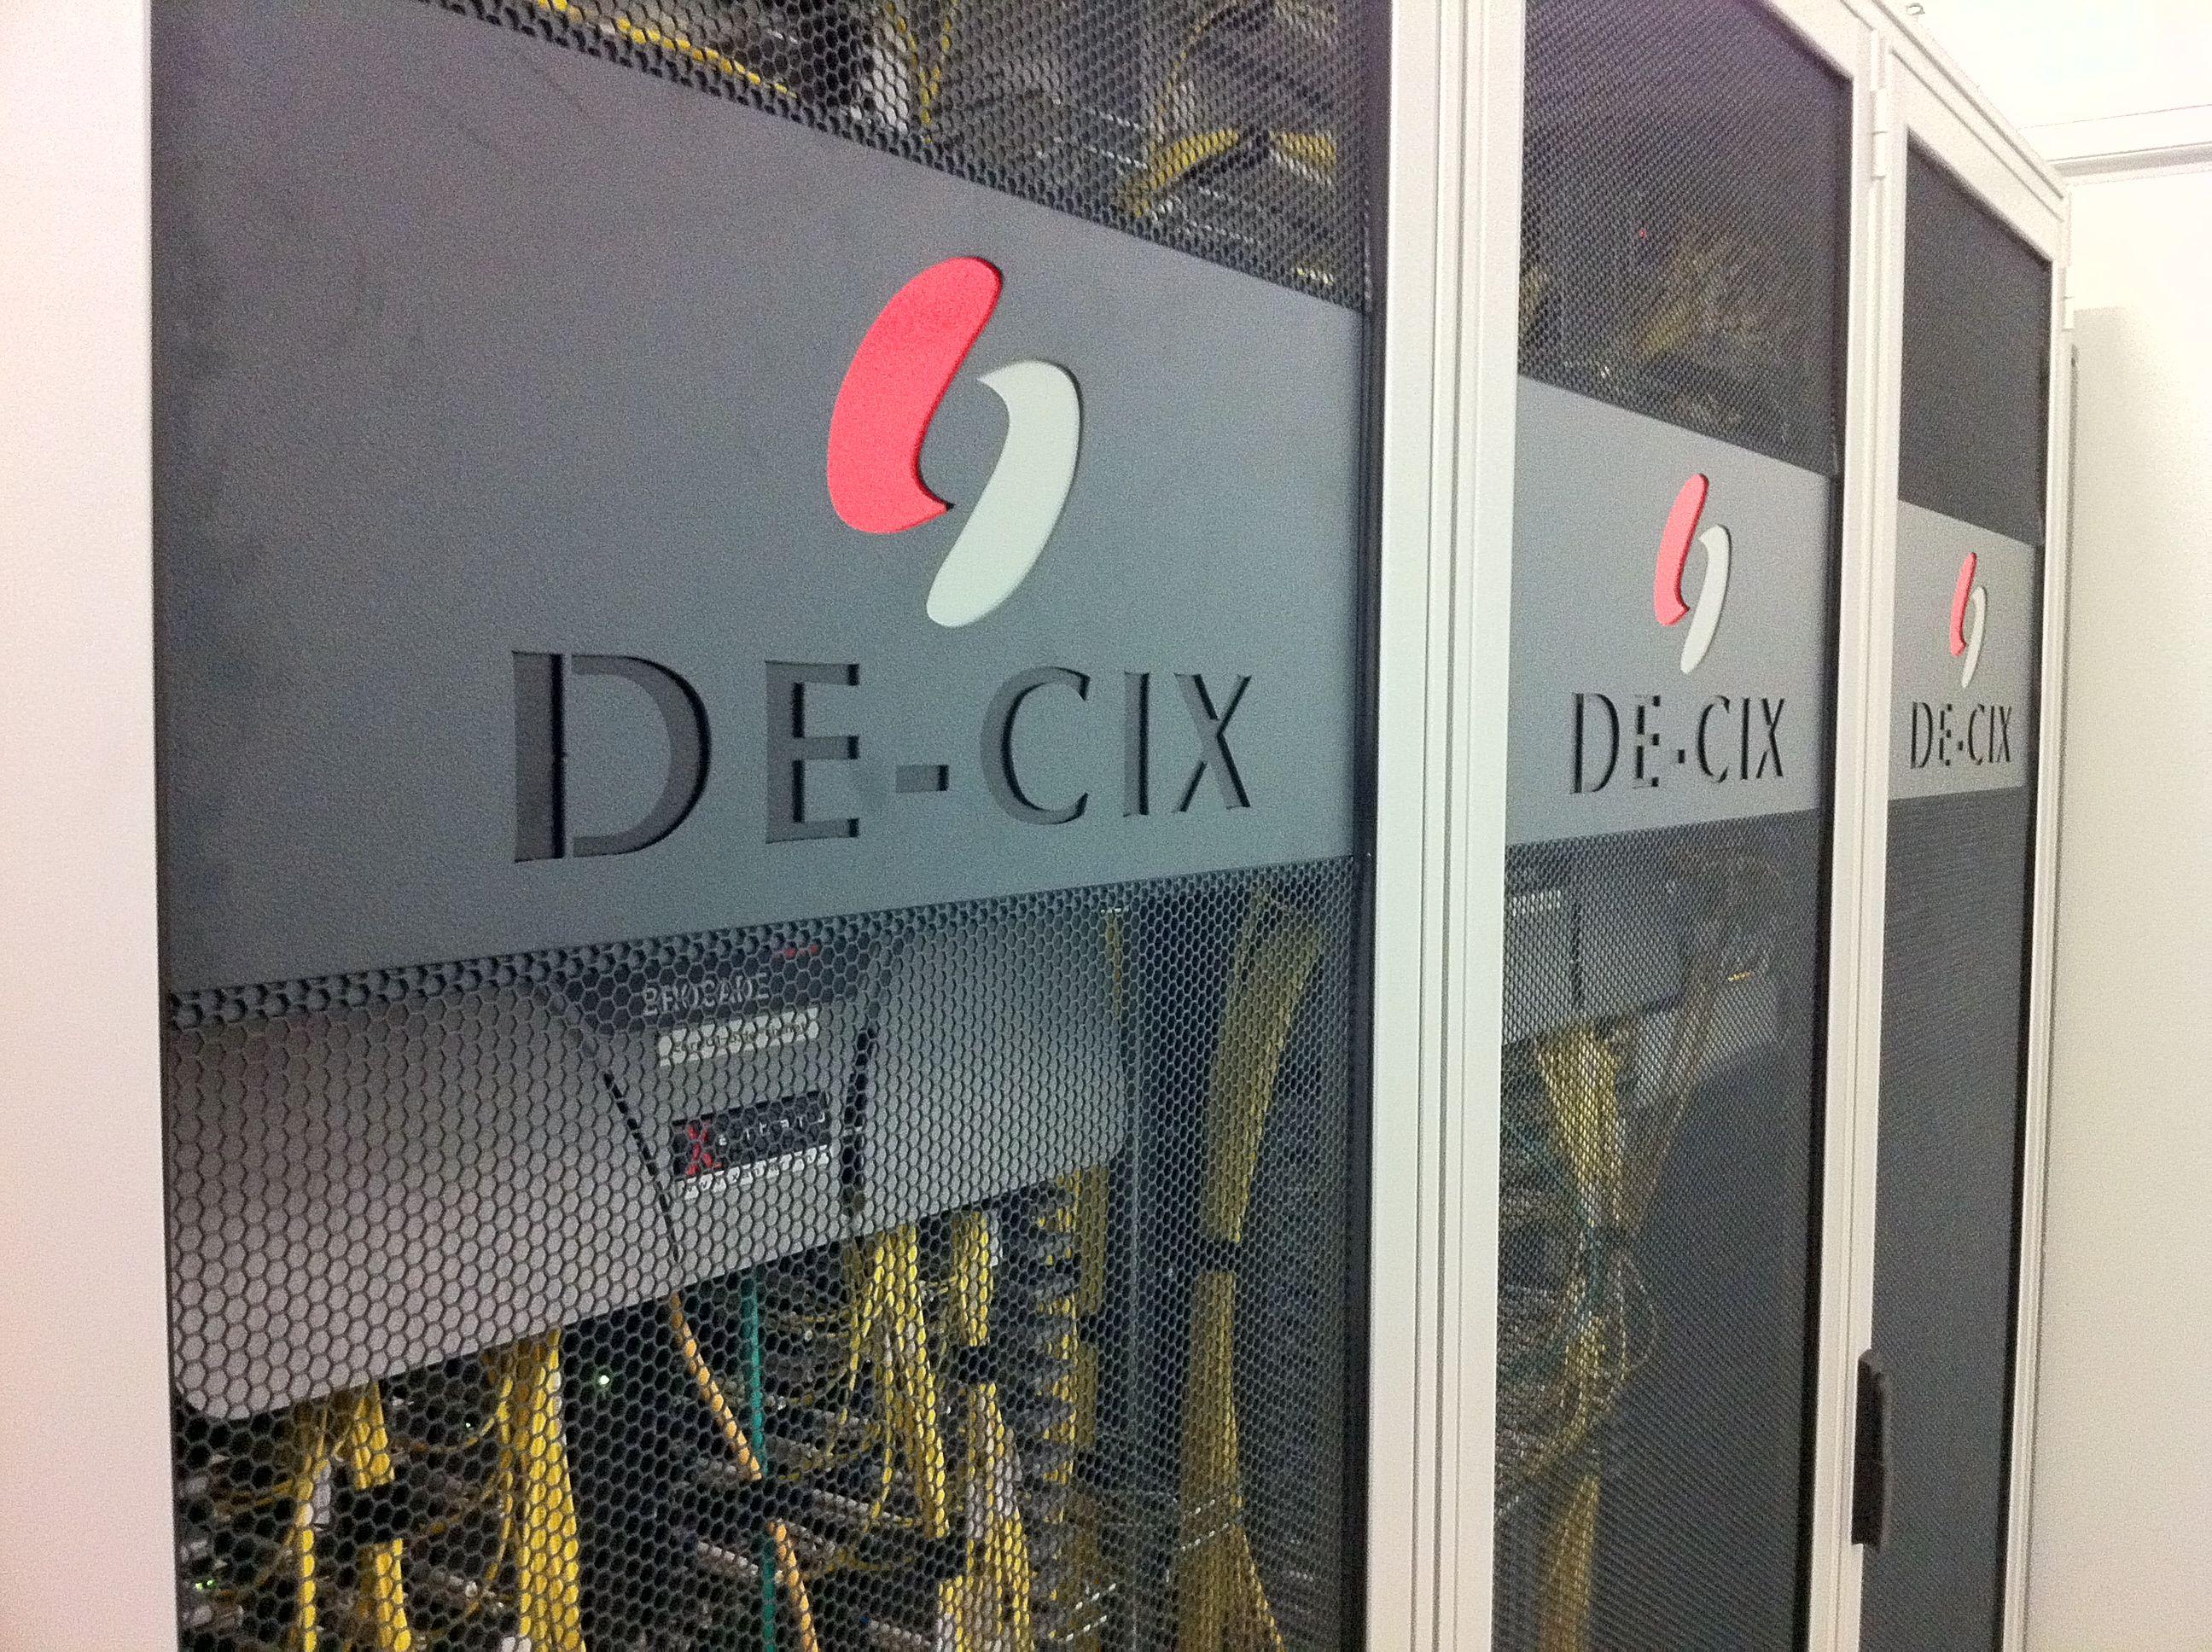 DE-CIX_GERMANY_-_Switch_Rack_(6218137120)